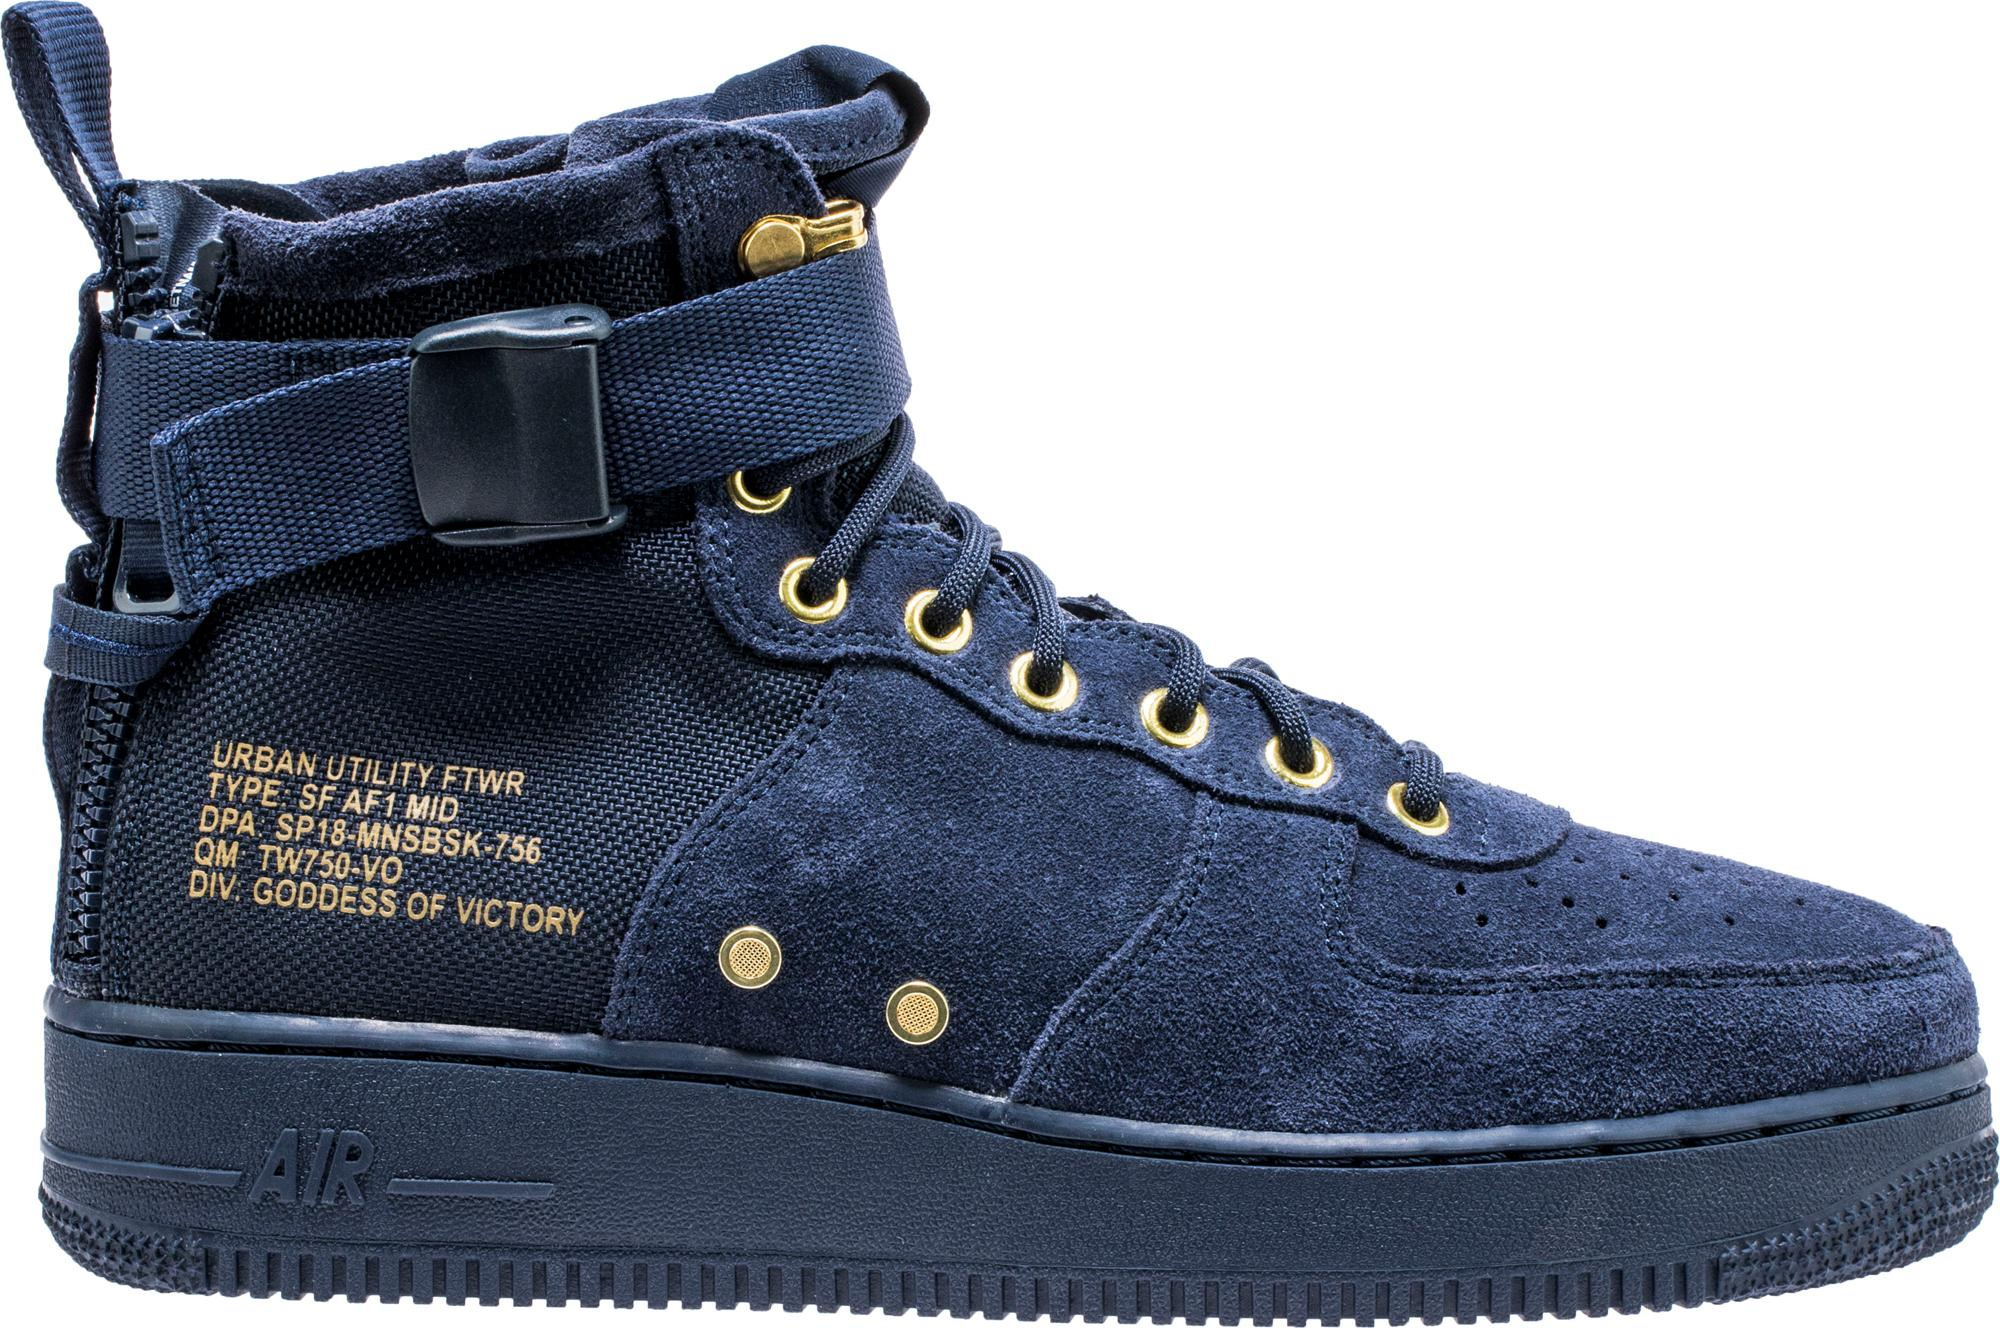 Nike Sf Air Force 1 Mid Obsidian